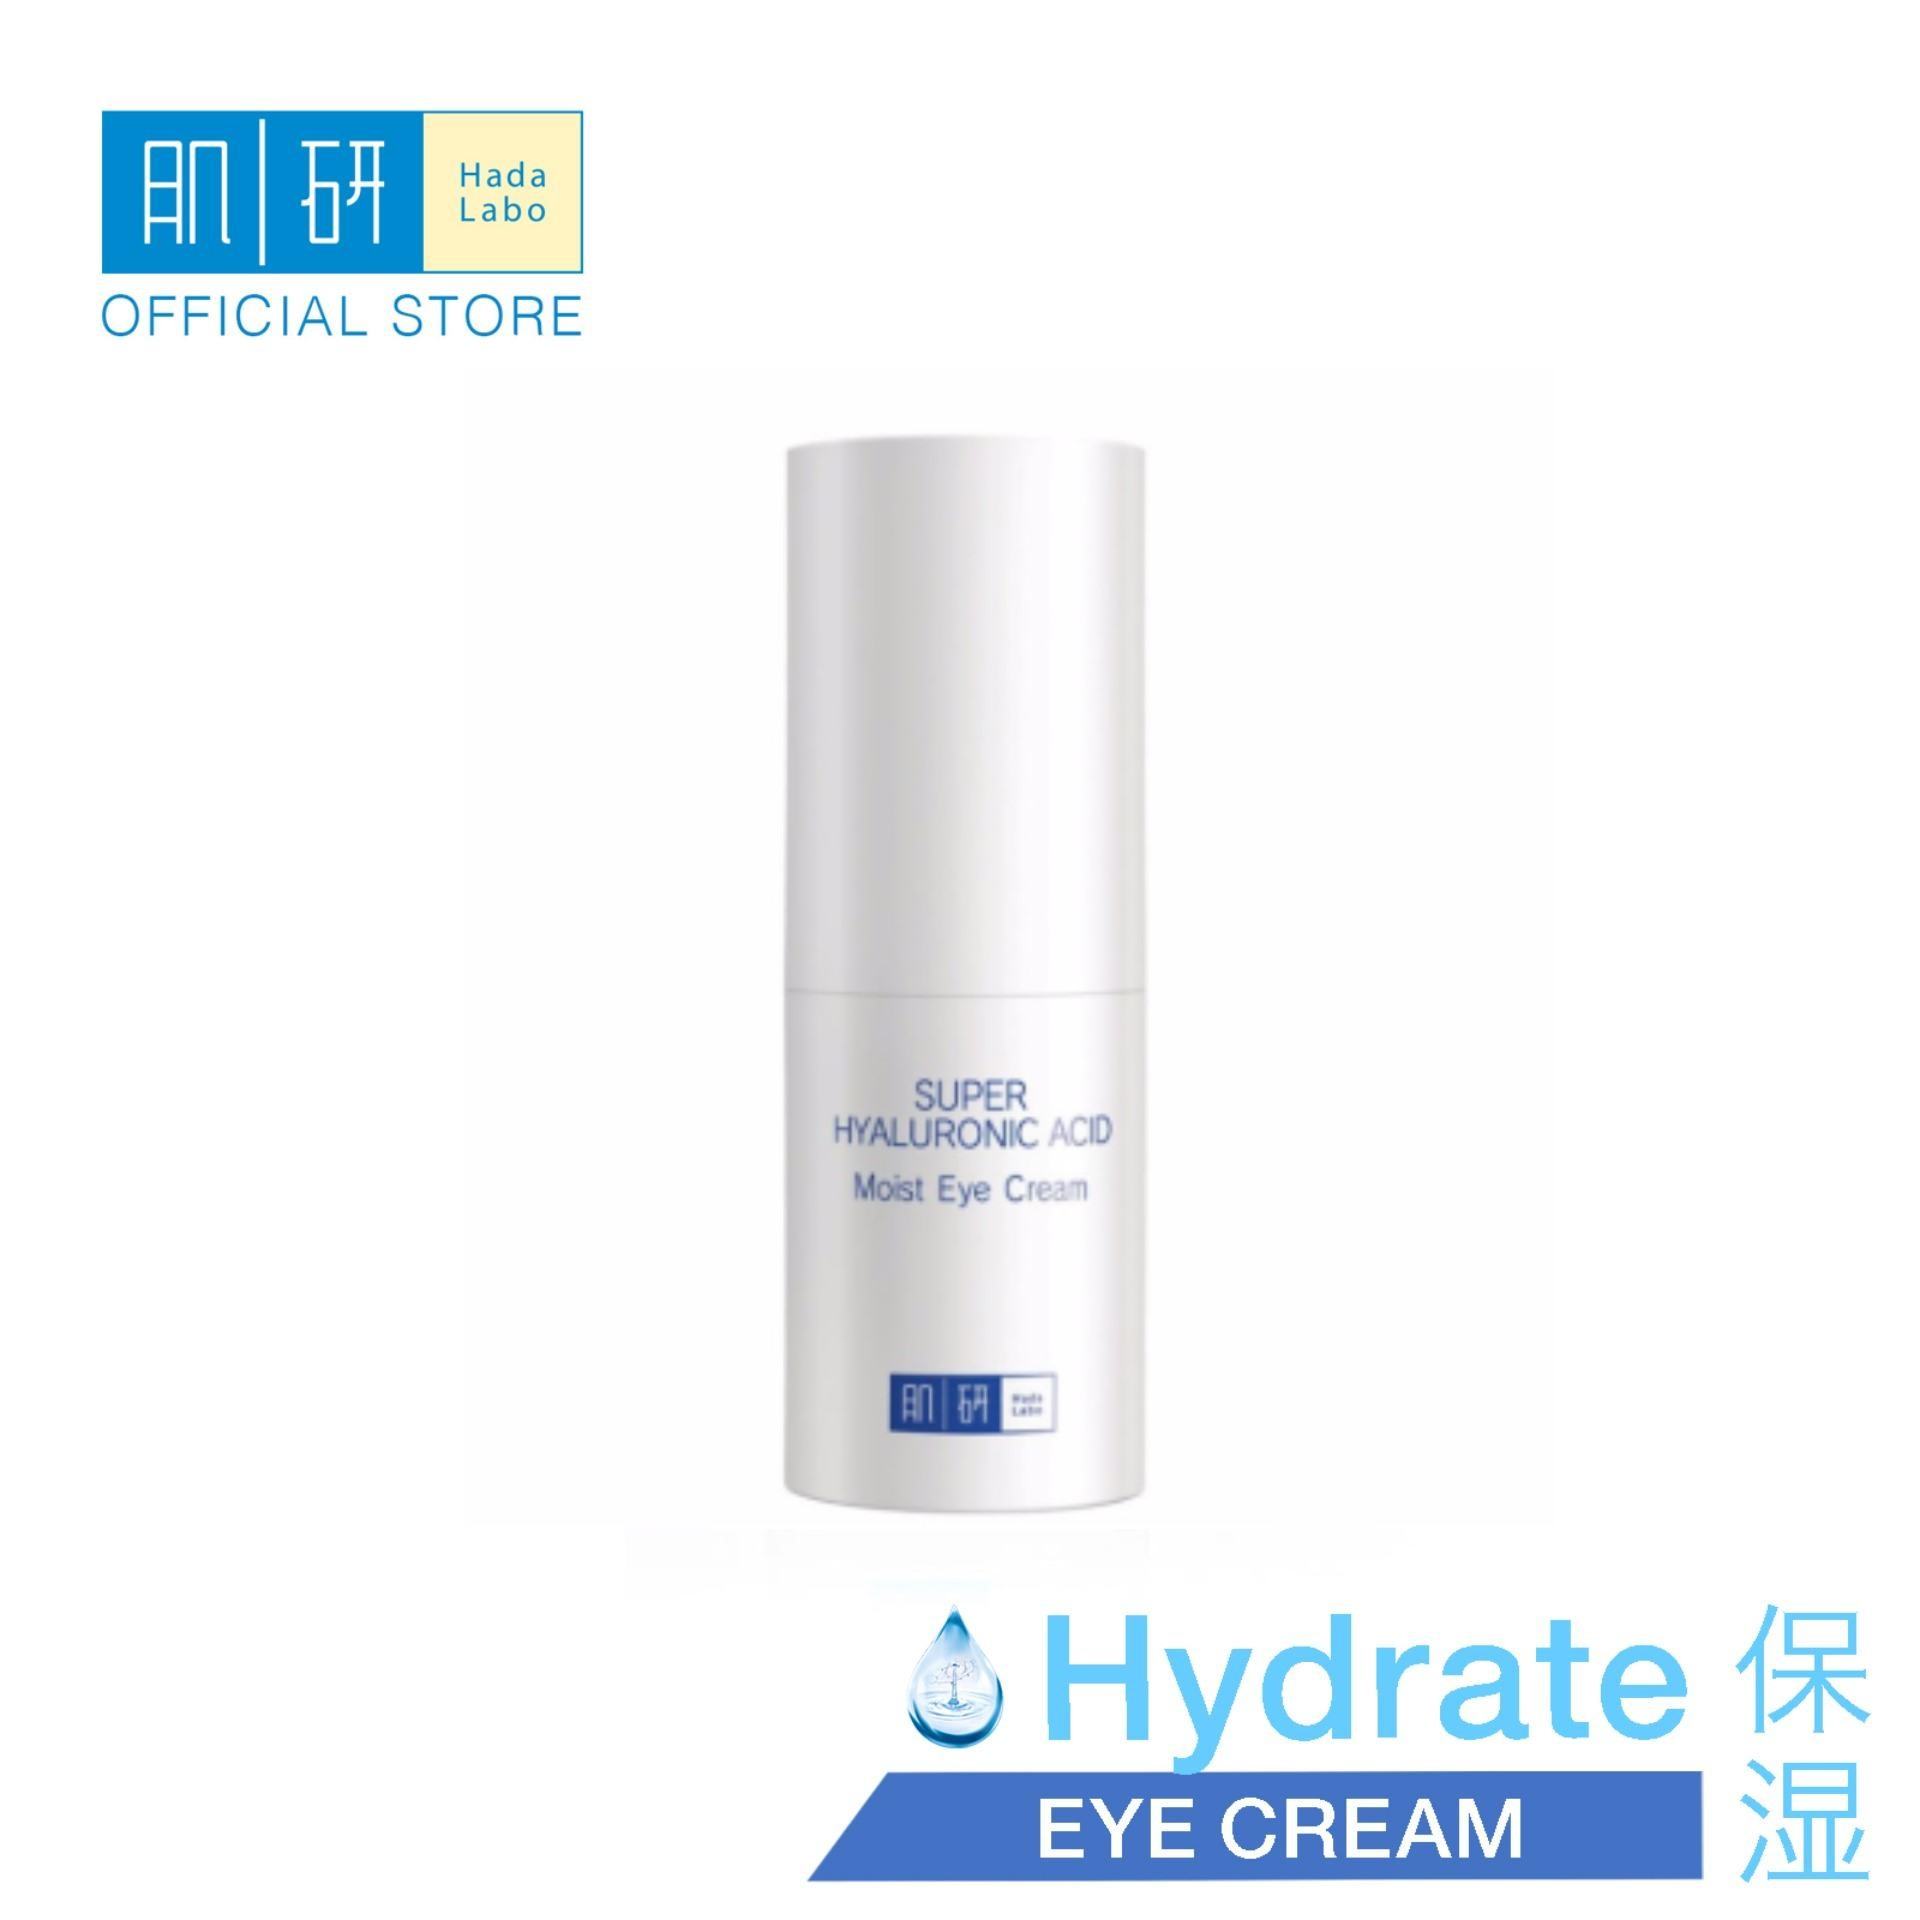 Hada Labo Super Hyaluronic Acid Moisturizing Eye Cream 15g.